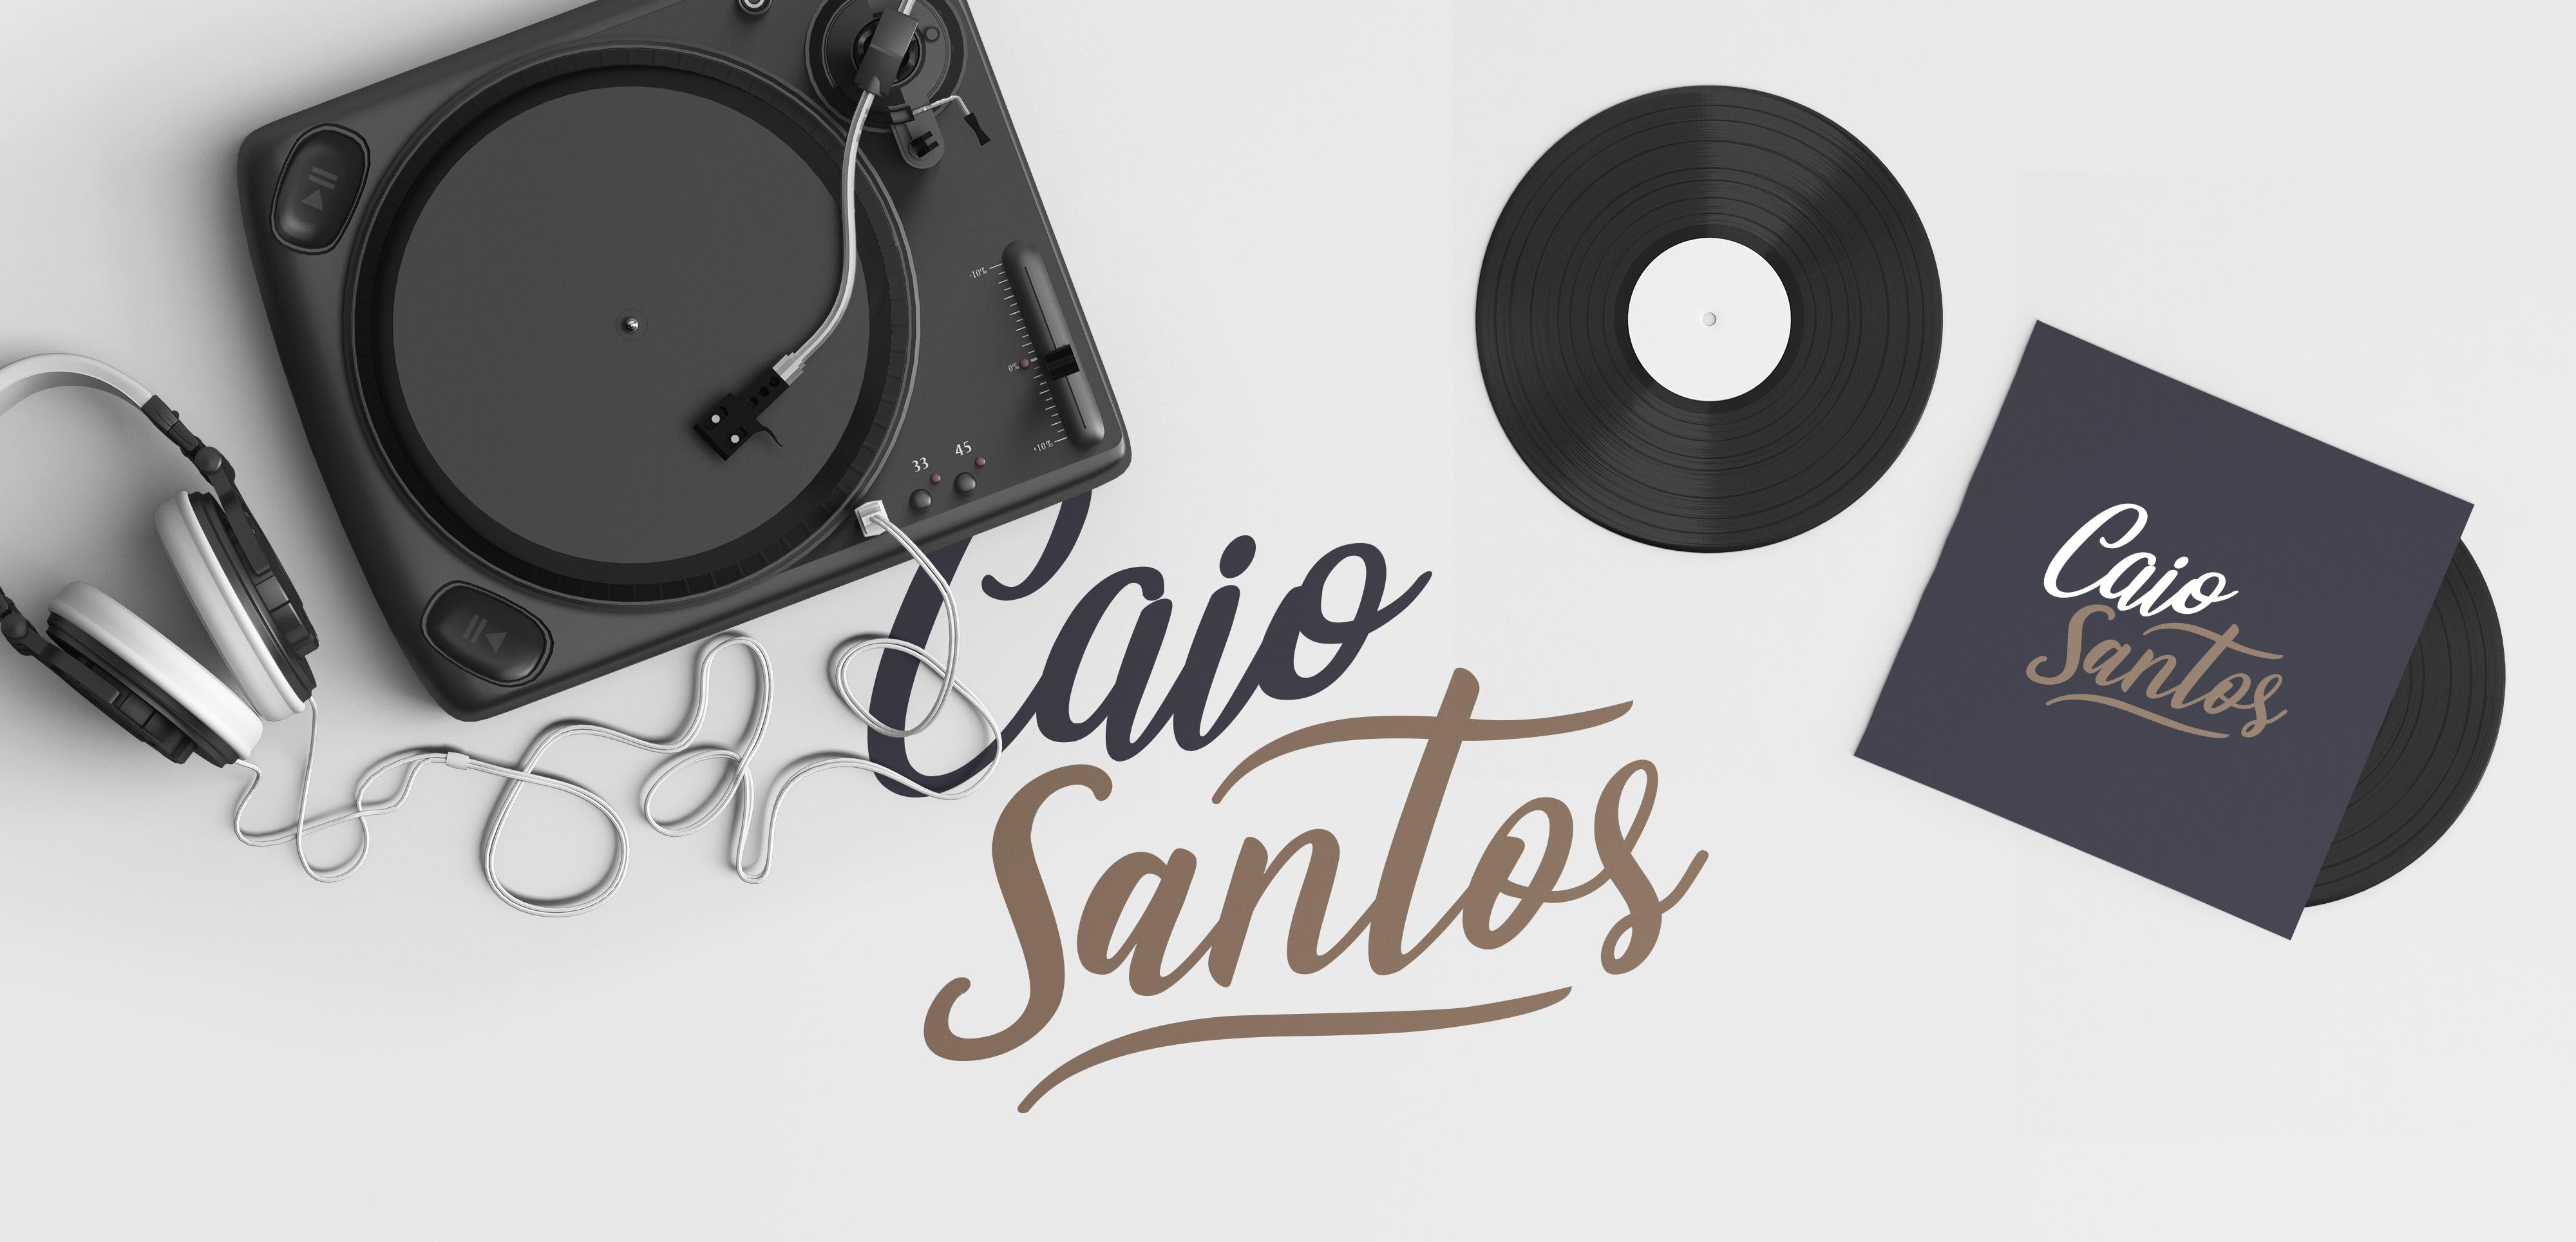 Caio Santos